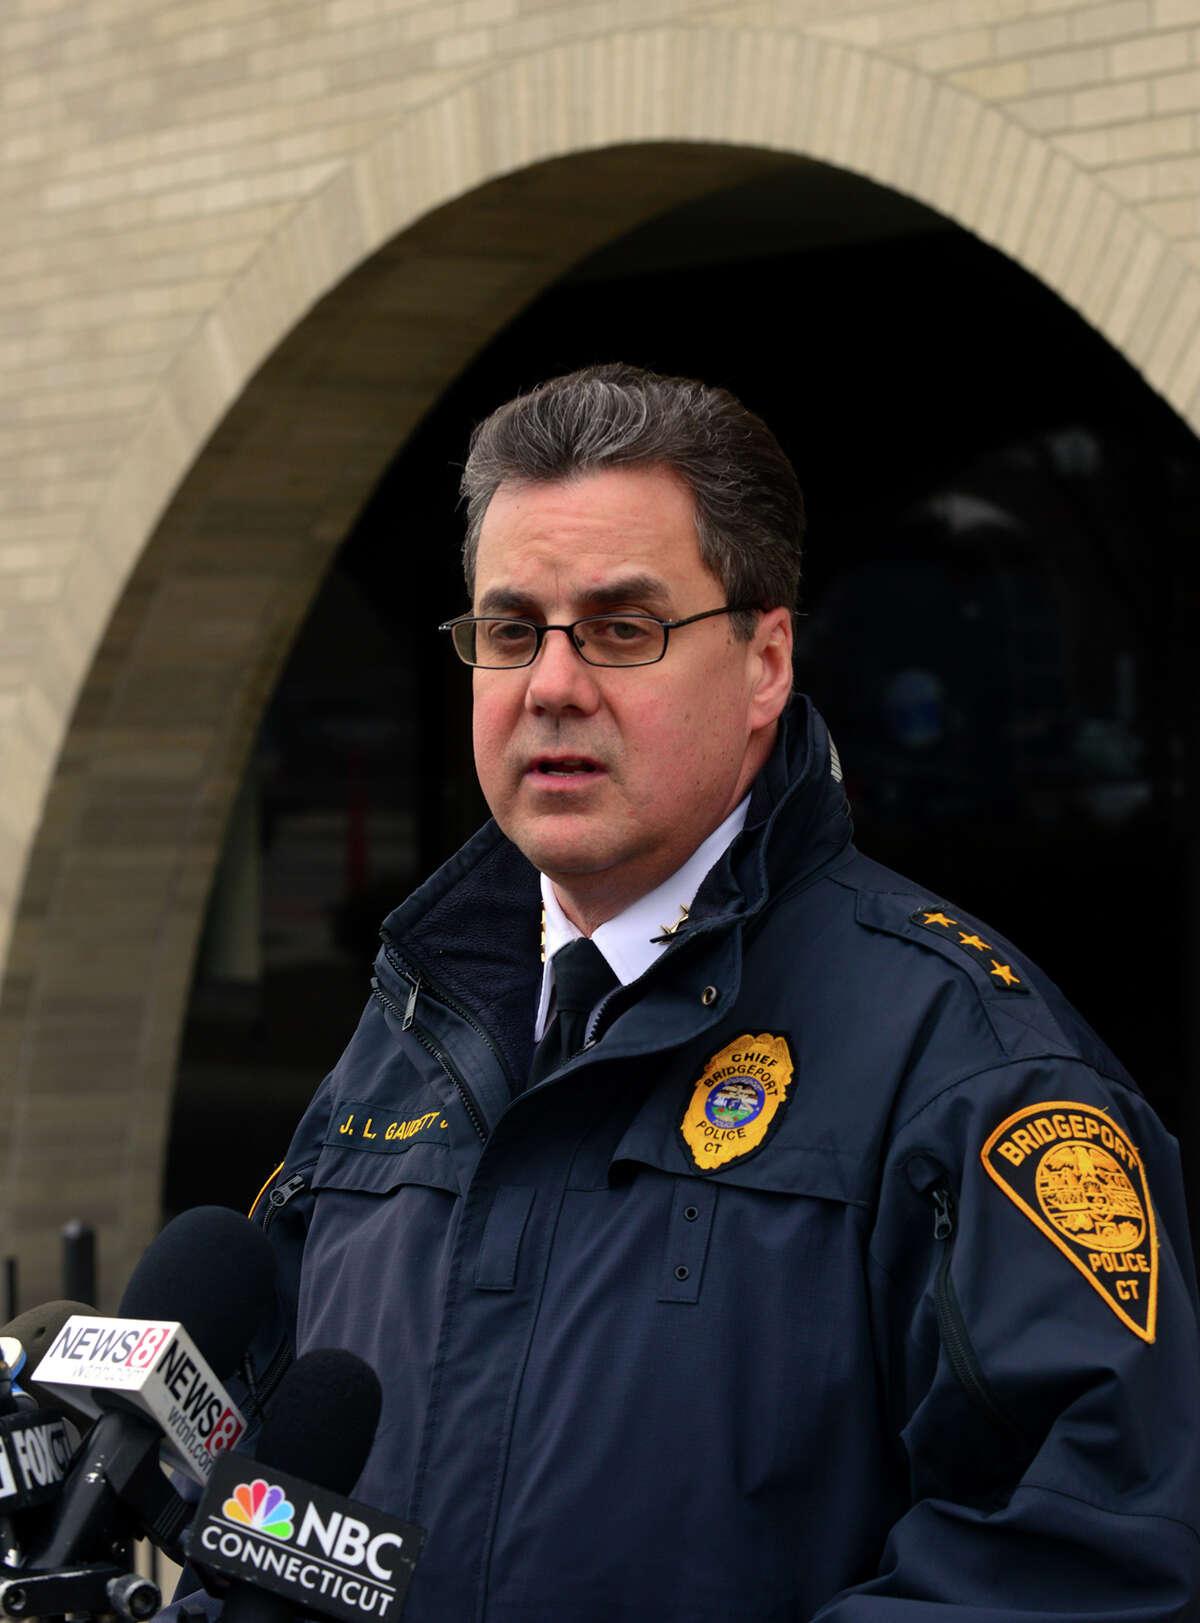 Bridgeport Chief of Police Joseph L. Gaudett, Jr.